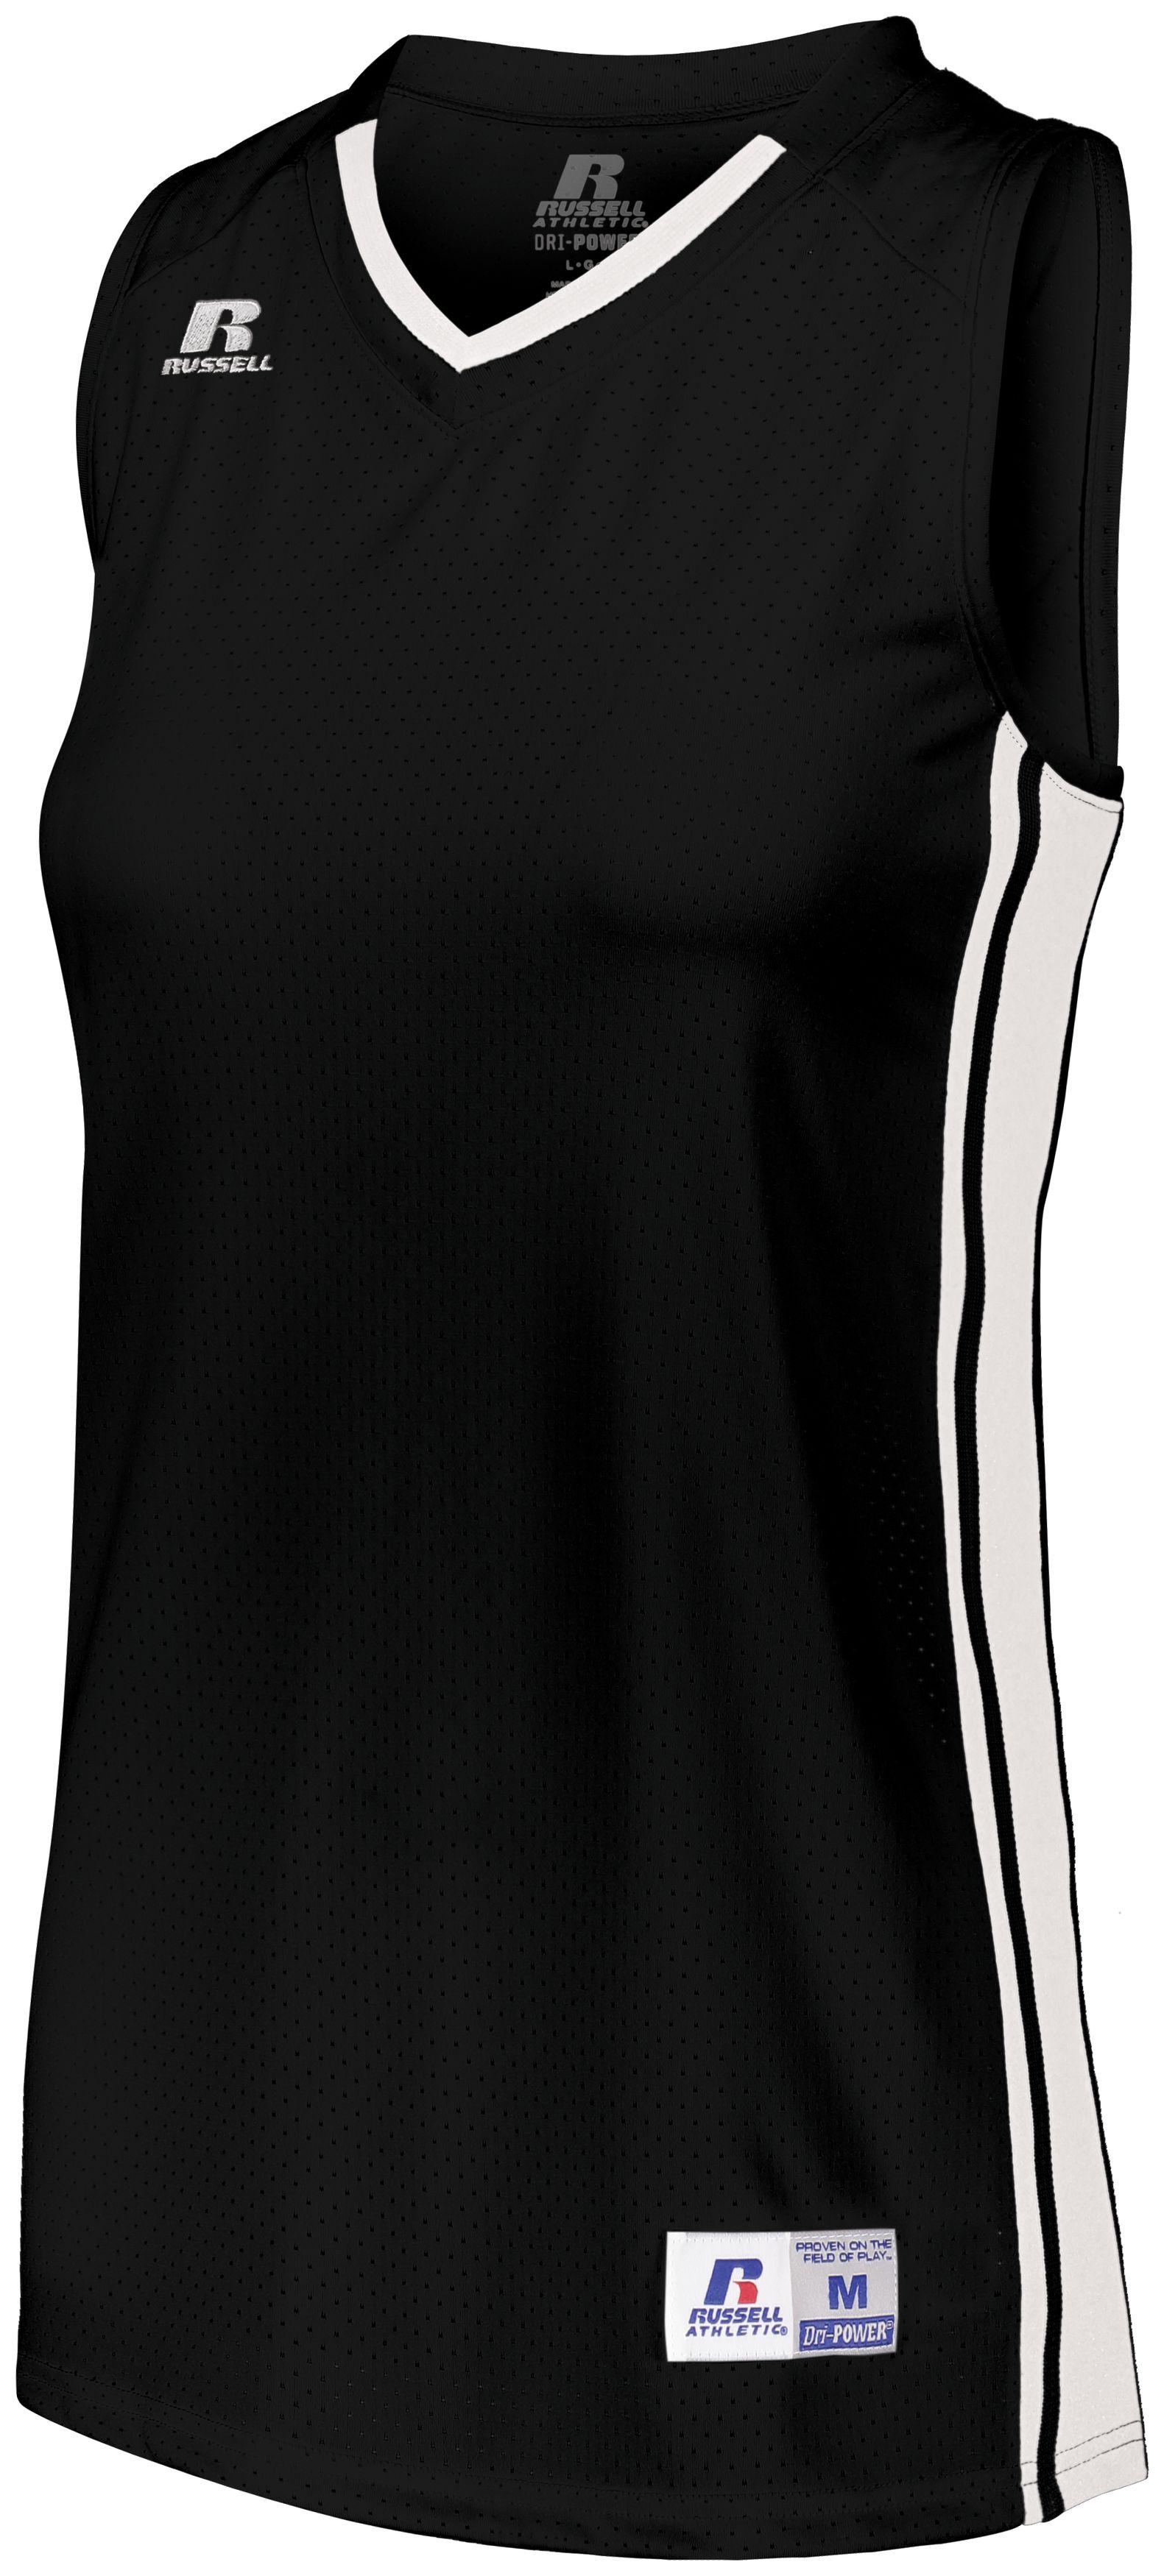 Ladies Legacy Basketball Jersey - Black/white